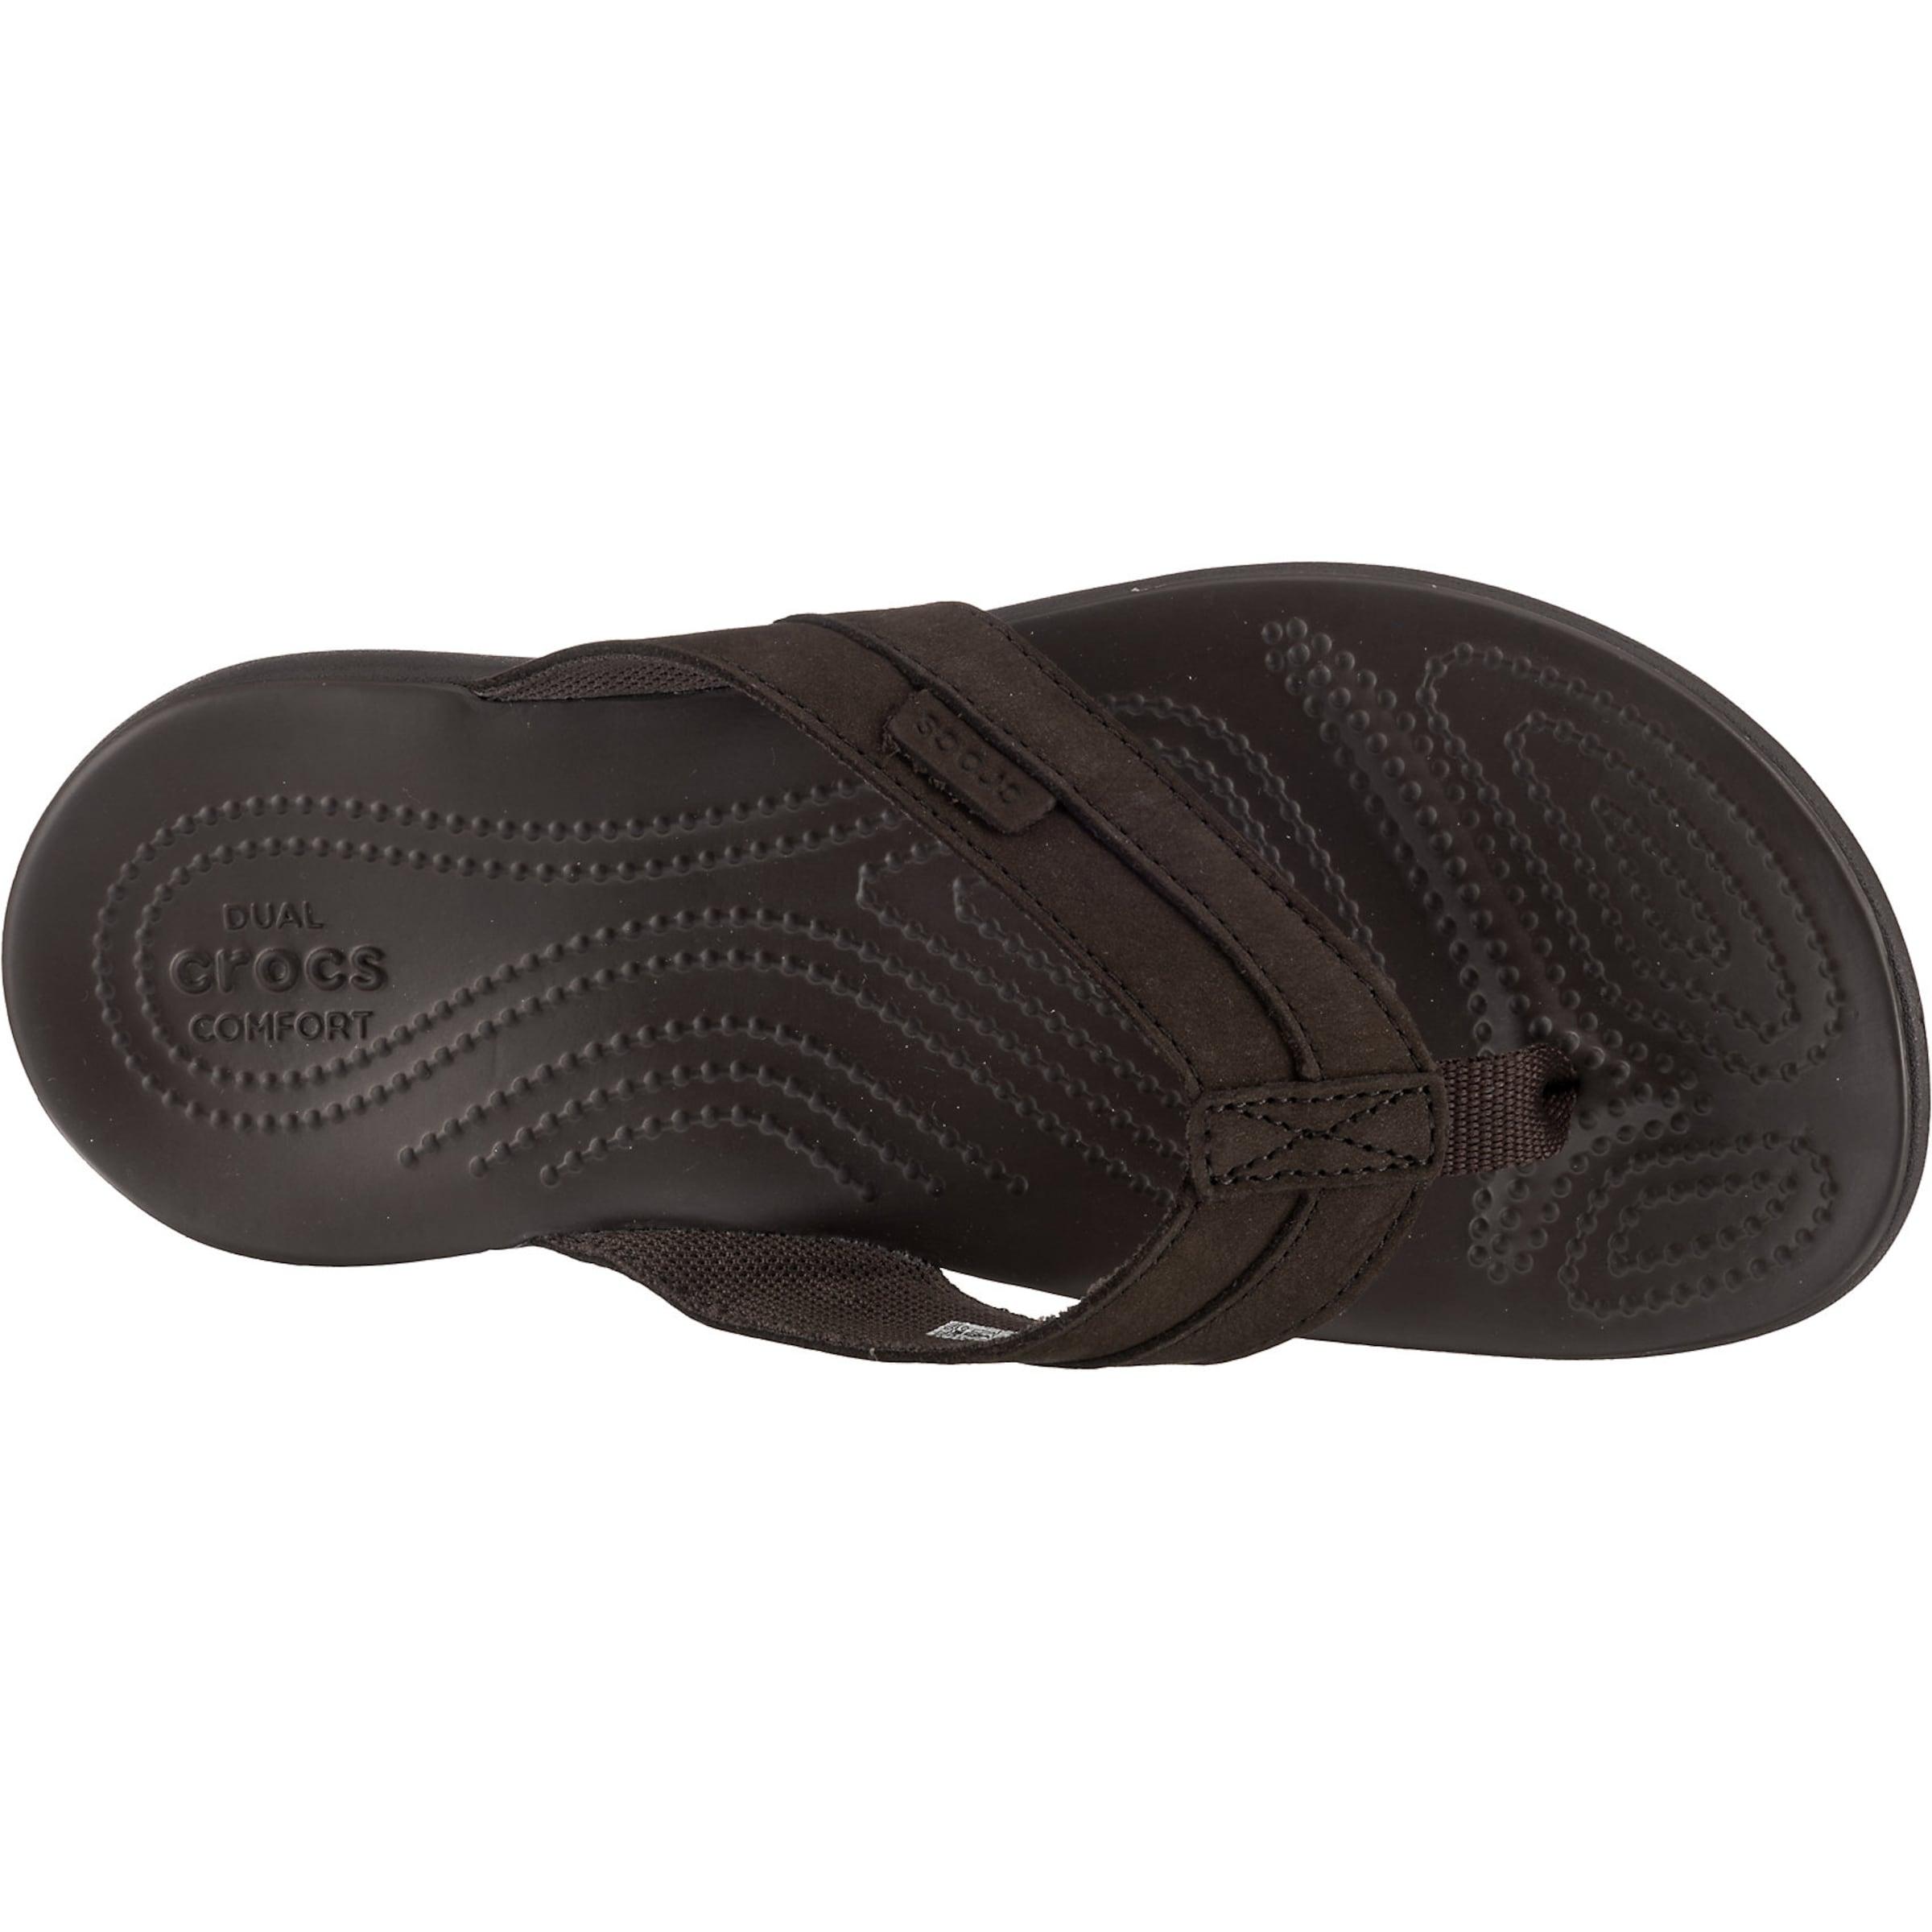 esp Santa M Braun Leather Esp Crocs Flip Zehentrenner Cruz In 8P0kNnwOX